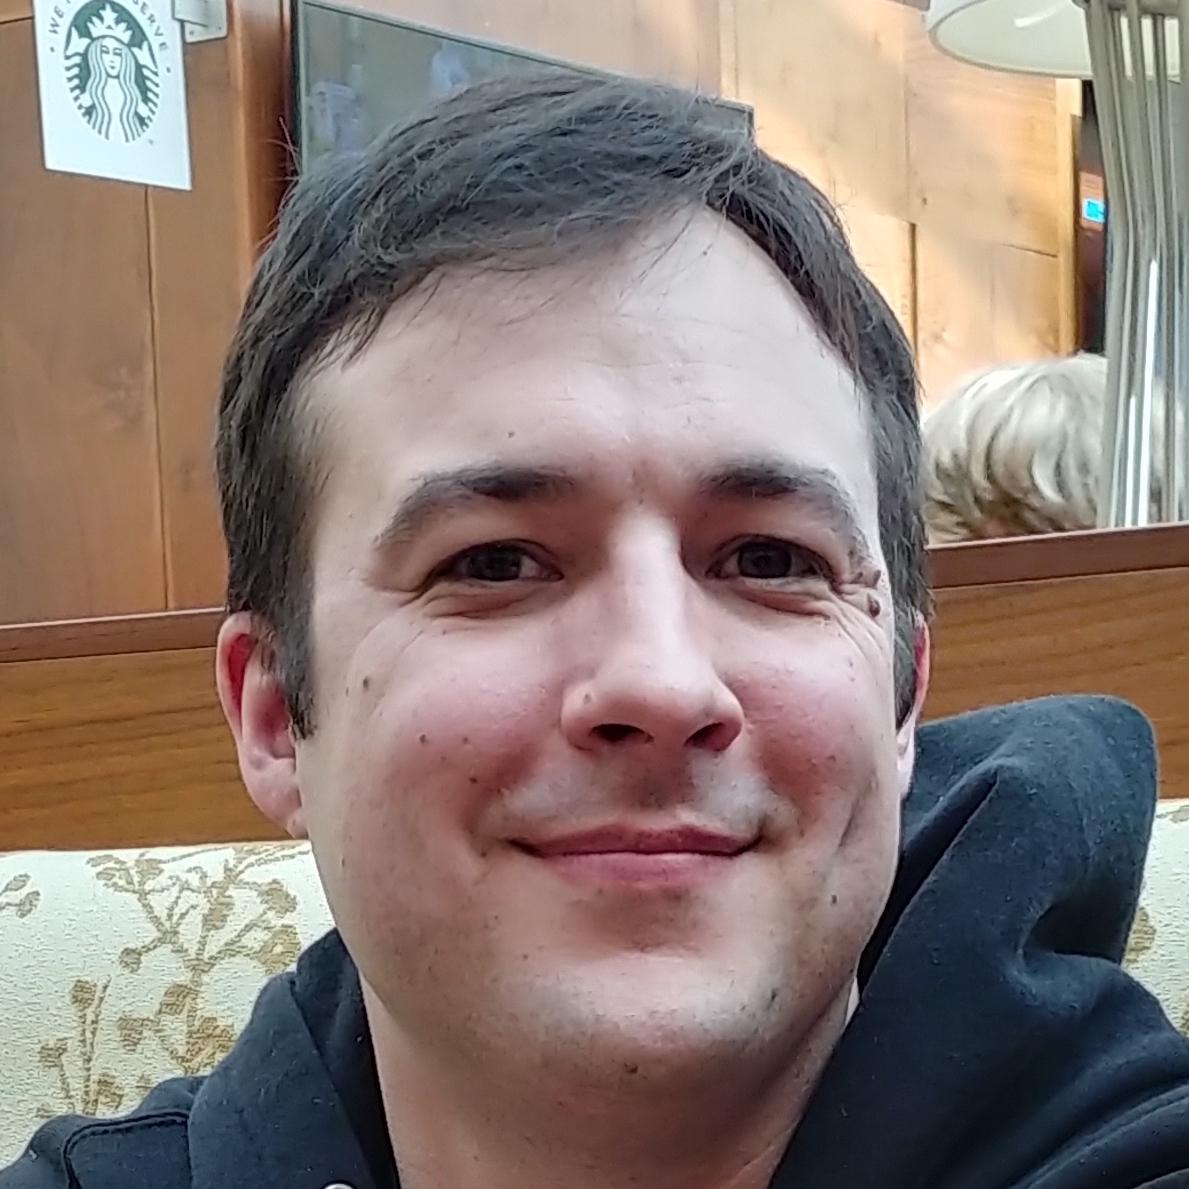 Josh Pearce